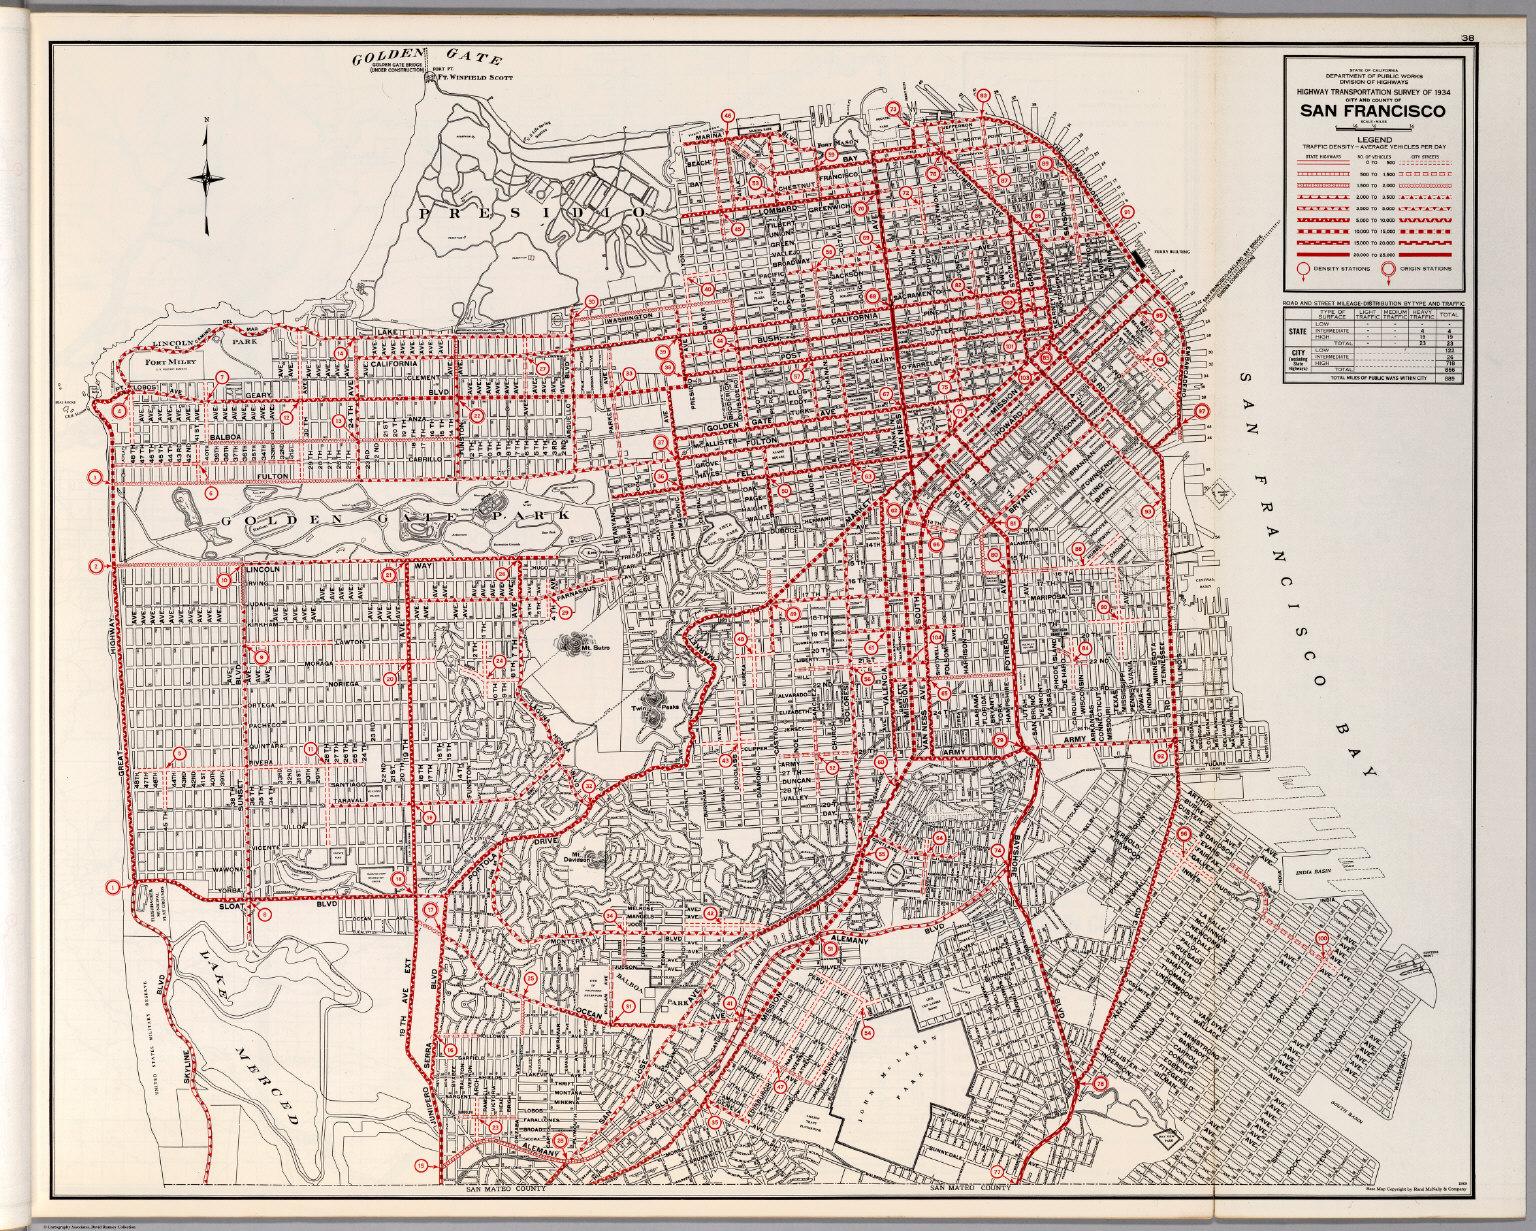 san francisco map 1900 City And County Of San Francisco David Rumsey Historical Map